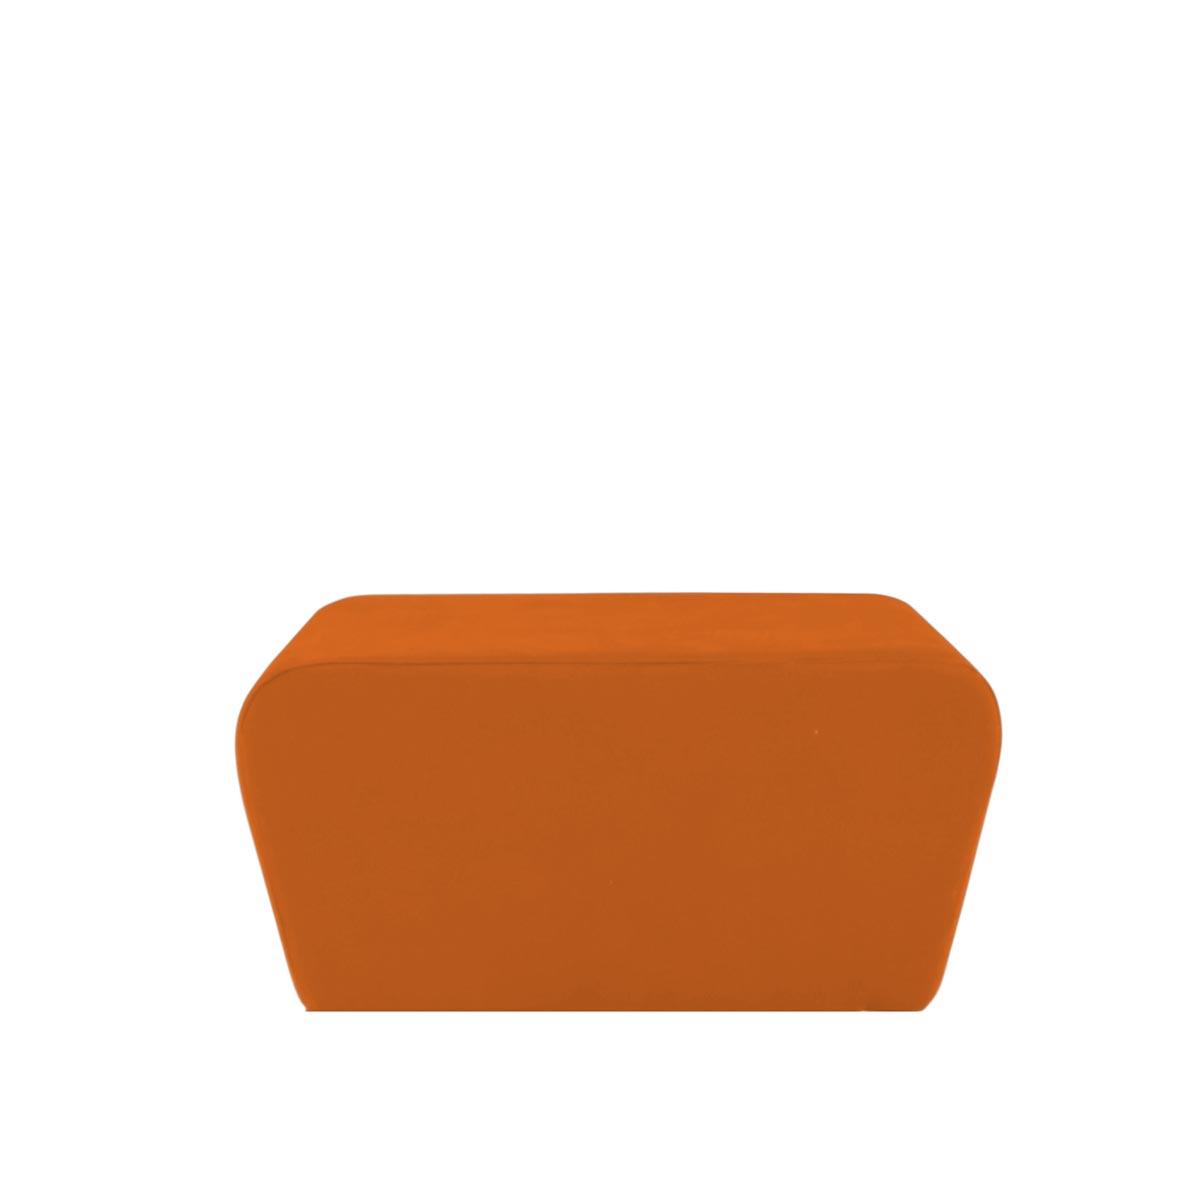 Pufe Muss R02 Tecido Lonita Laranja 03